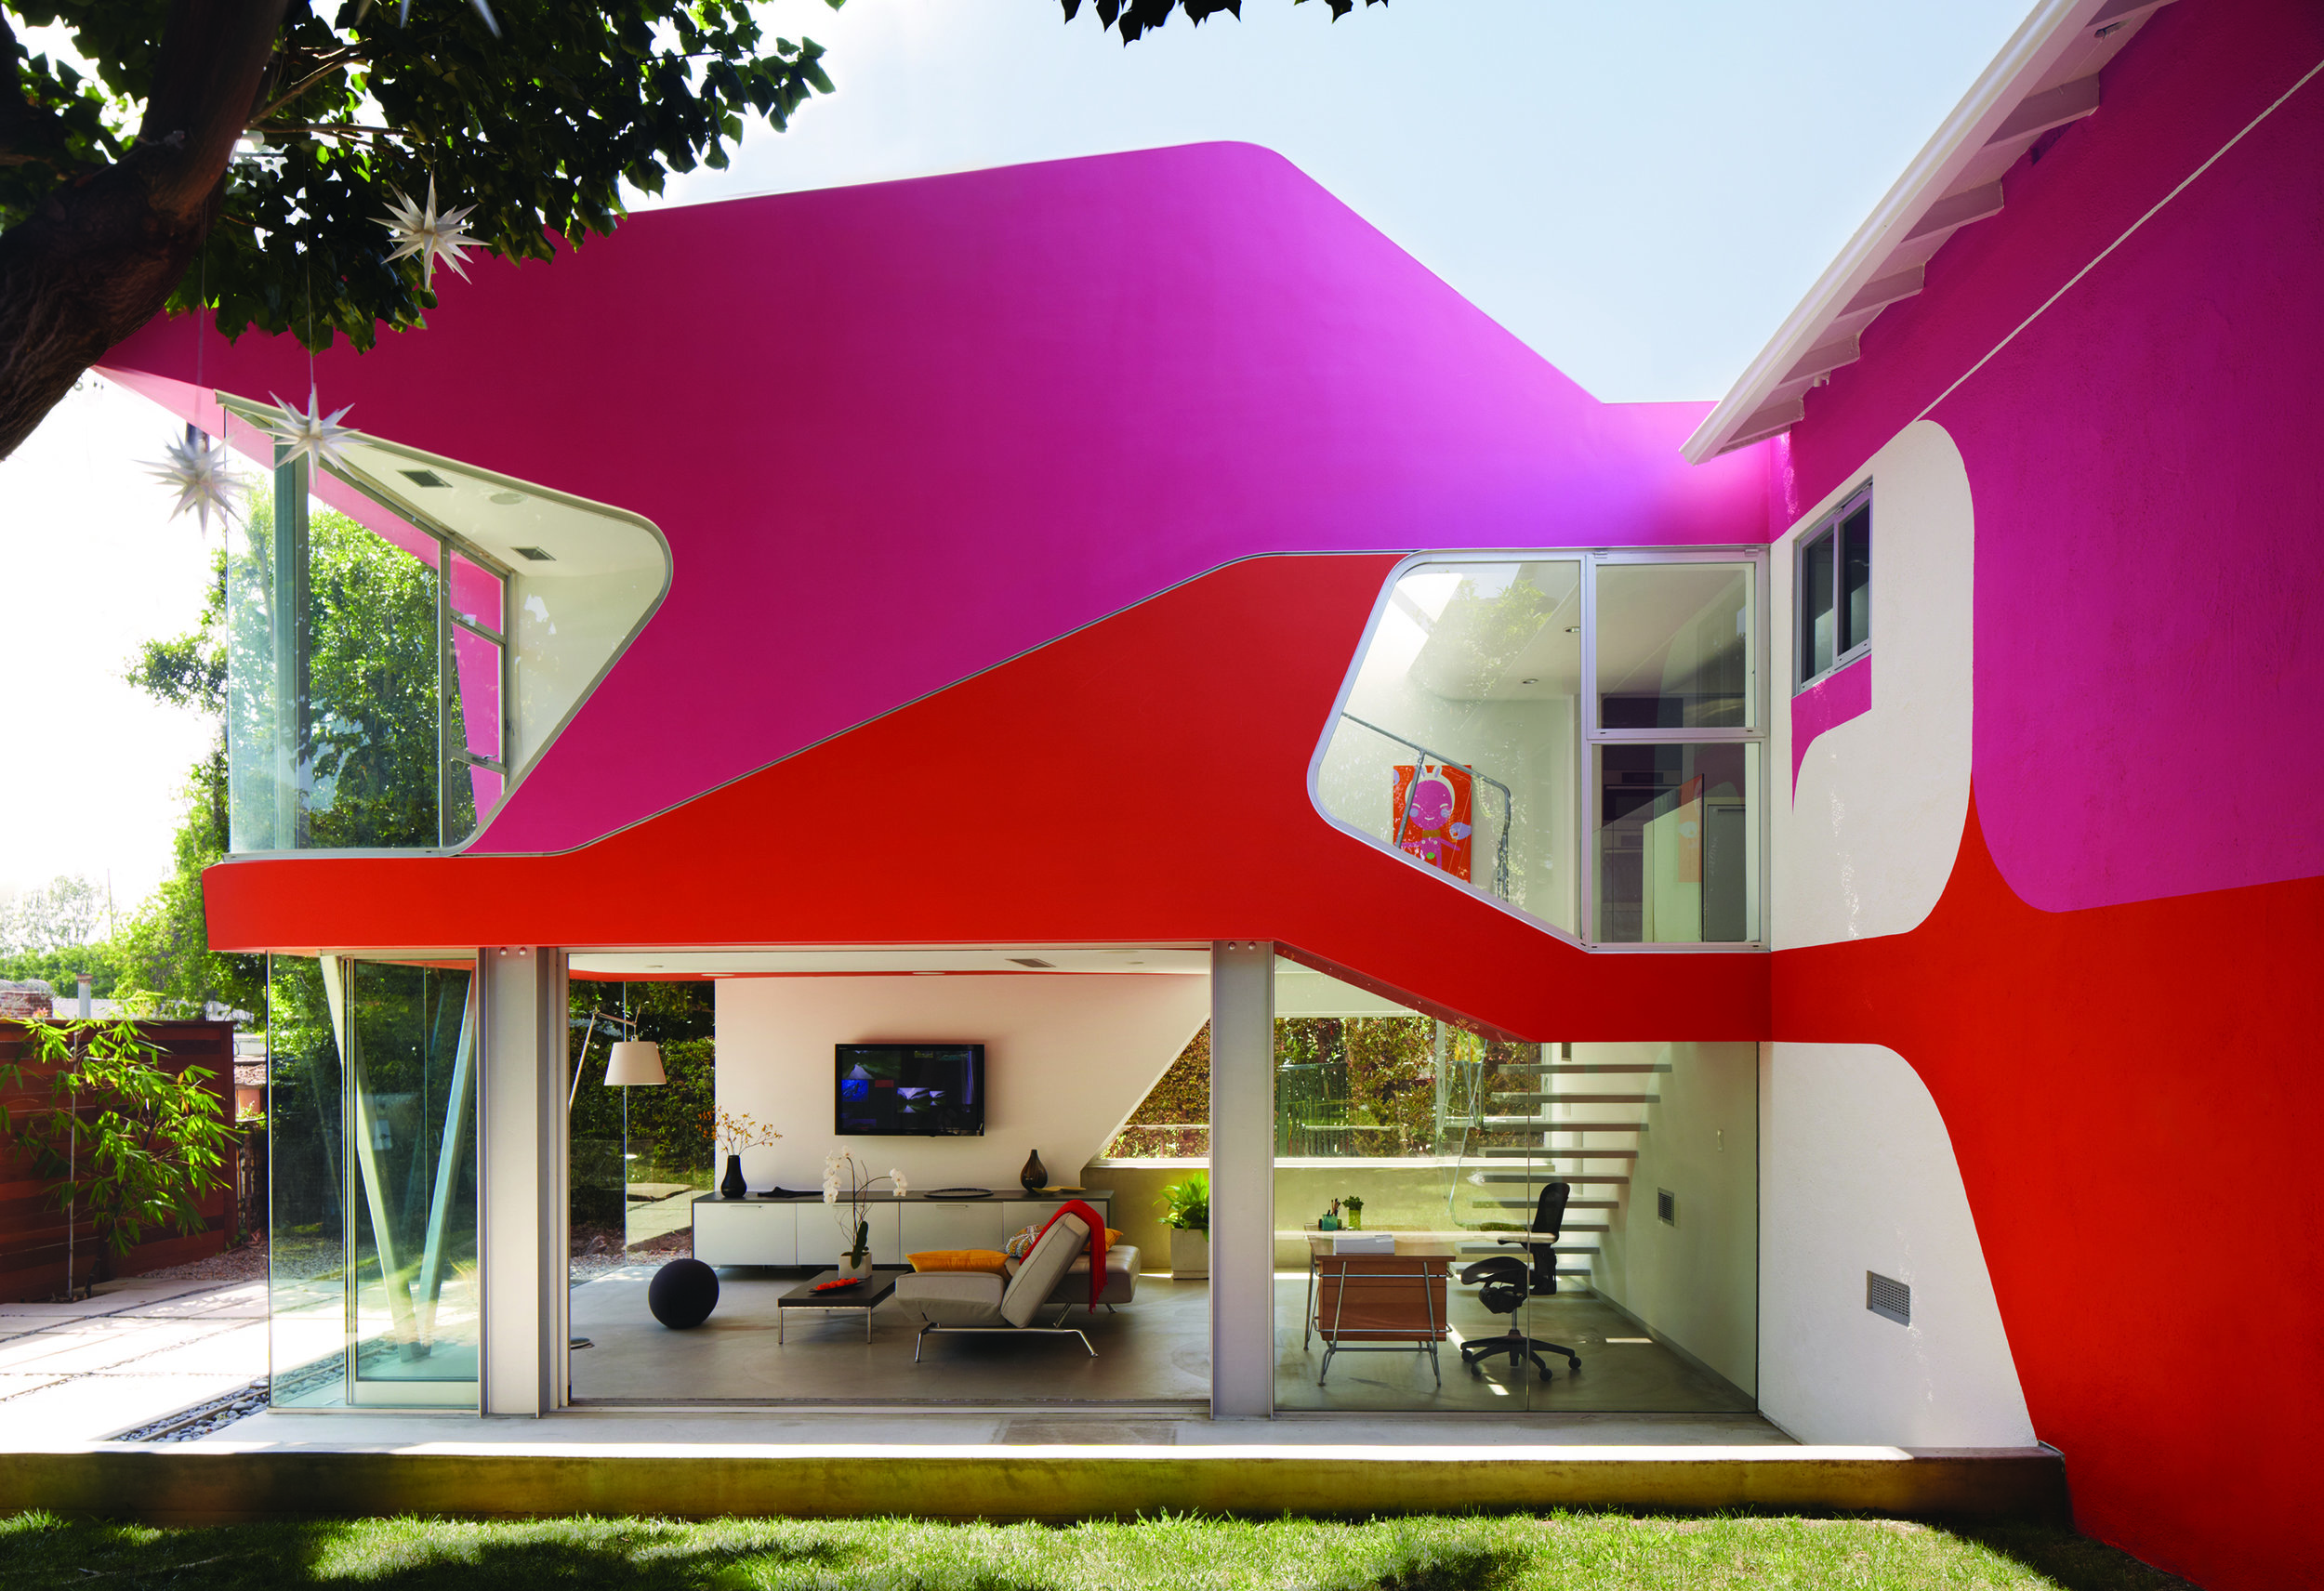 turkel_design_modern_prefab_home_axiomdeserthouse_partners_dunn_edwards_paint.jpg